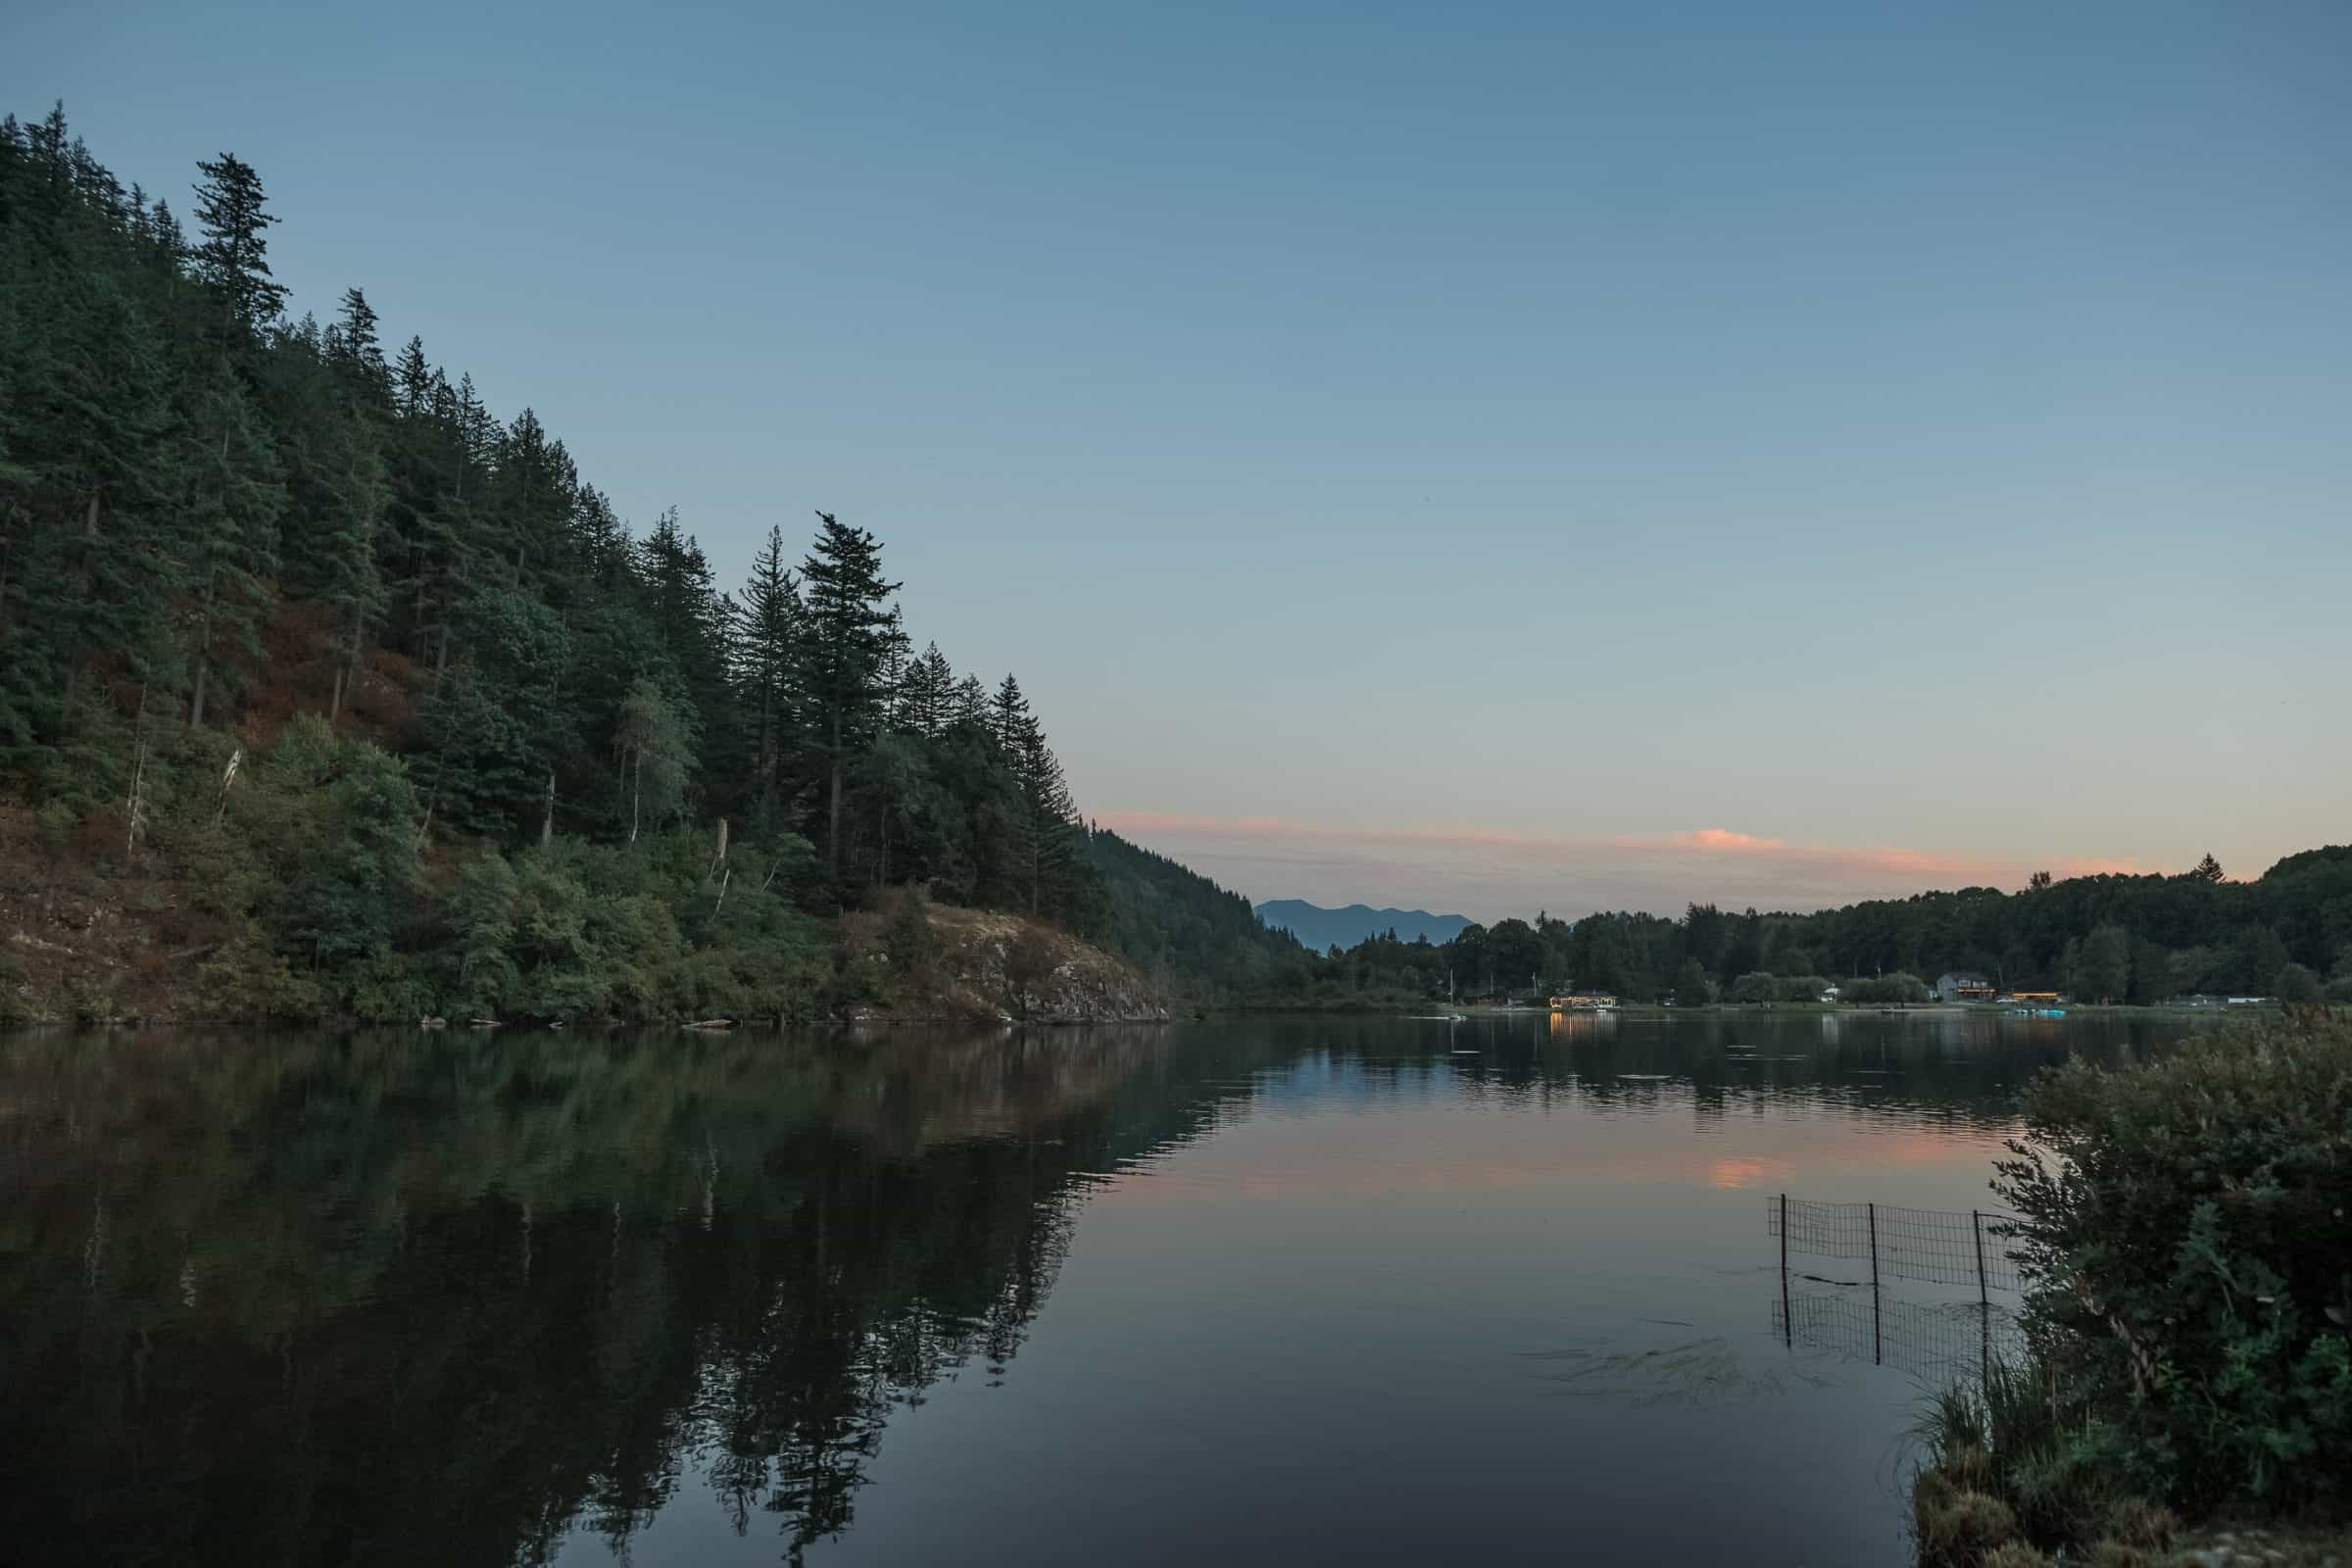 scenic shot of lake at sunset